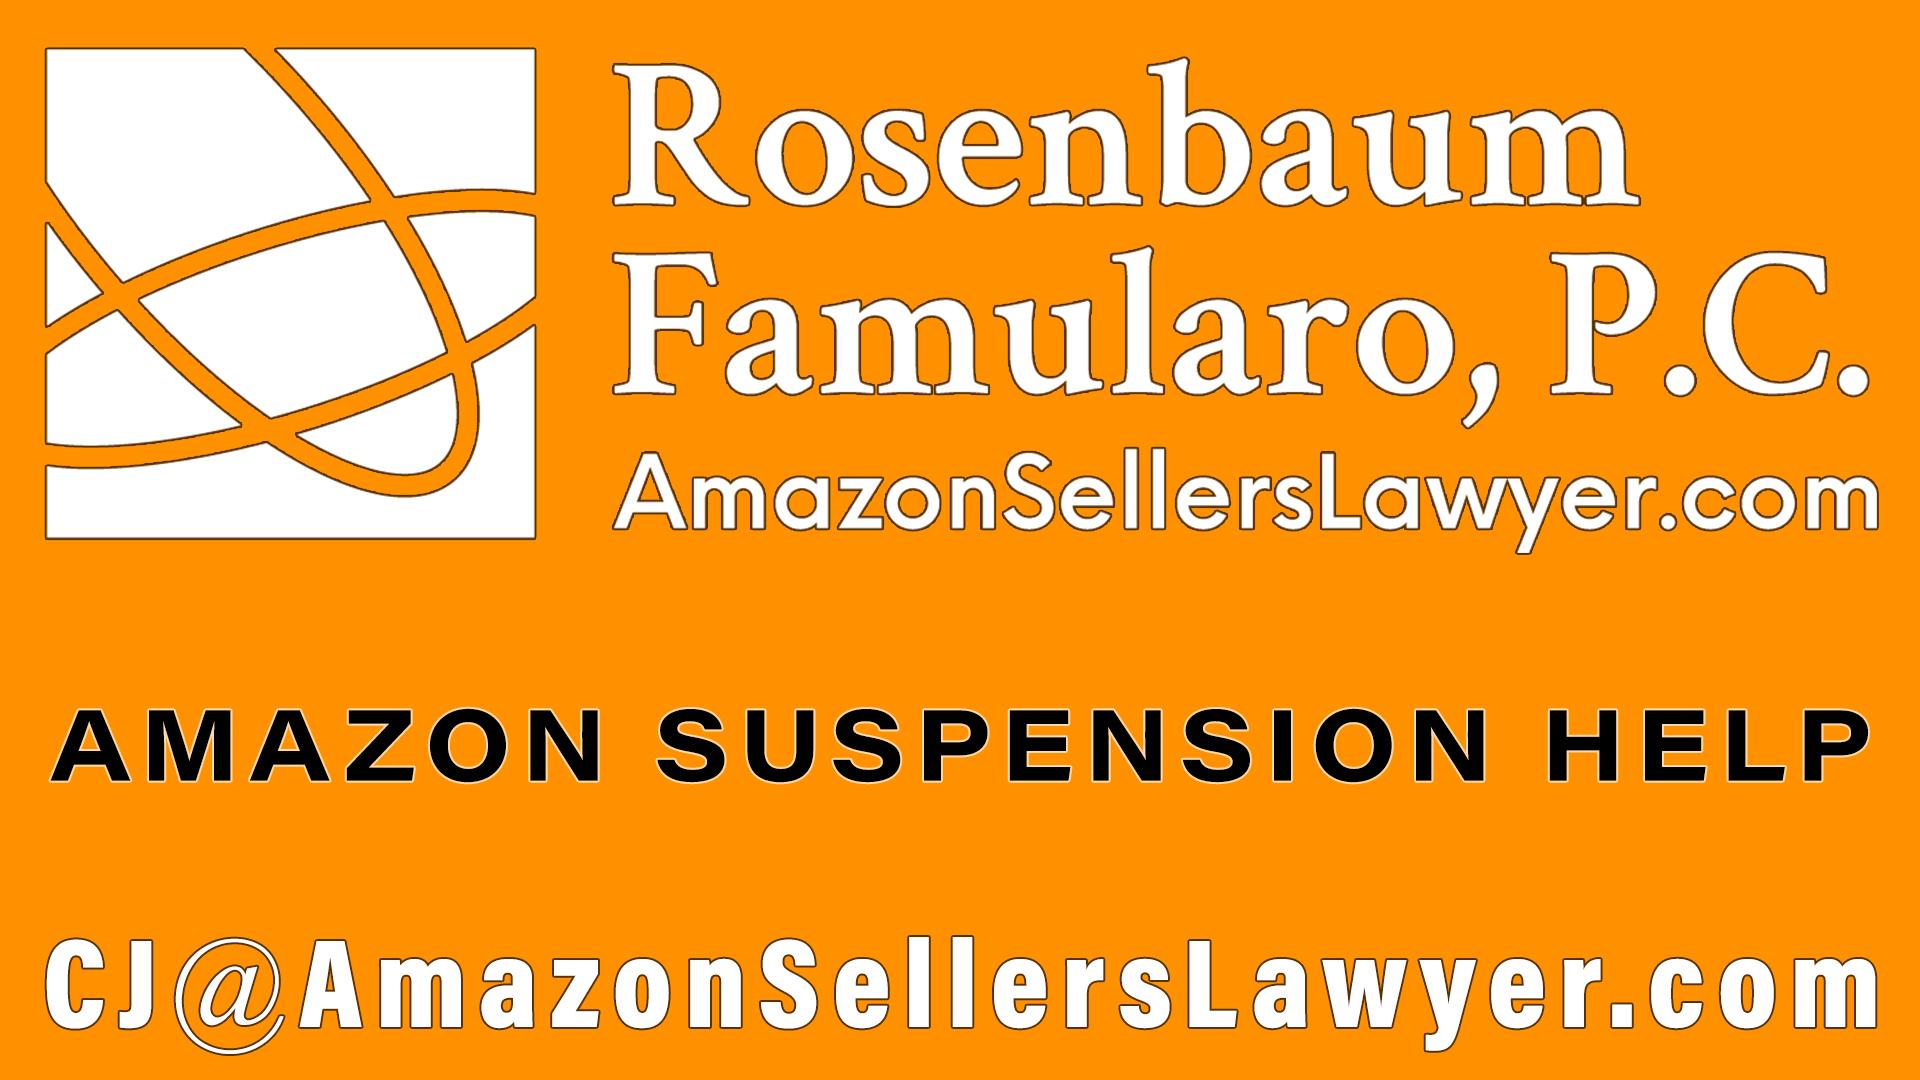 Amazon suspension help